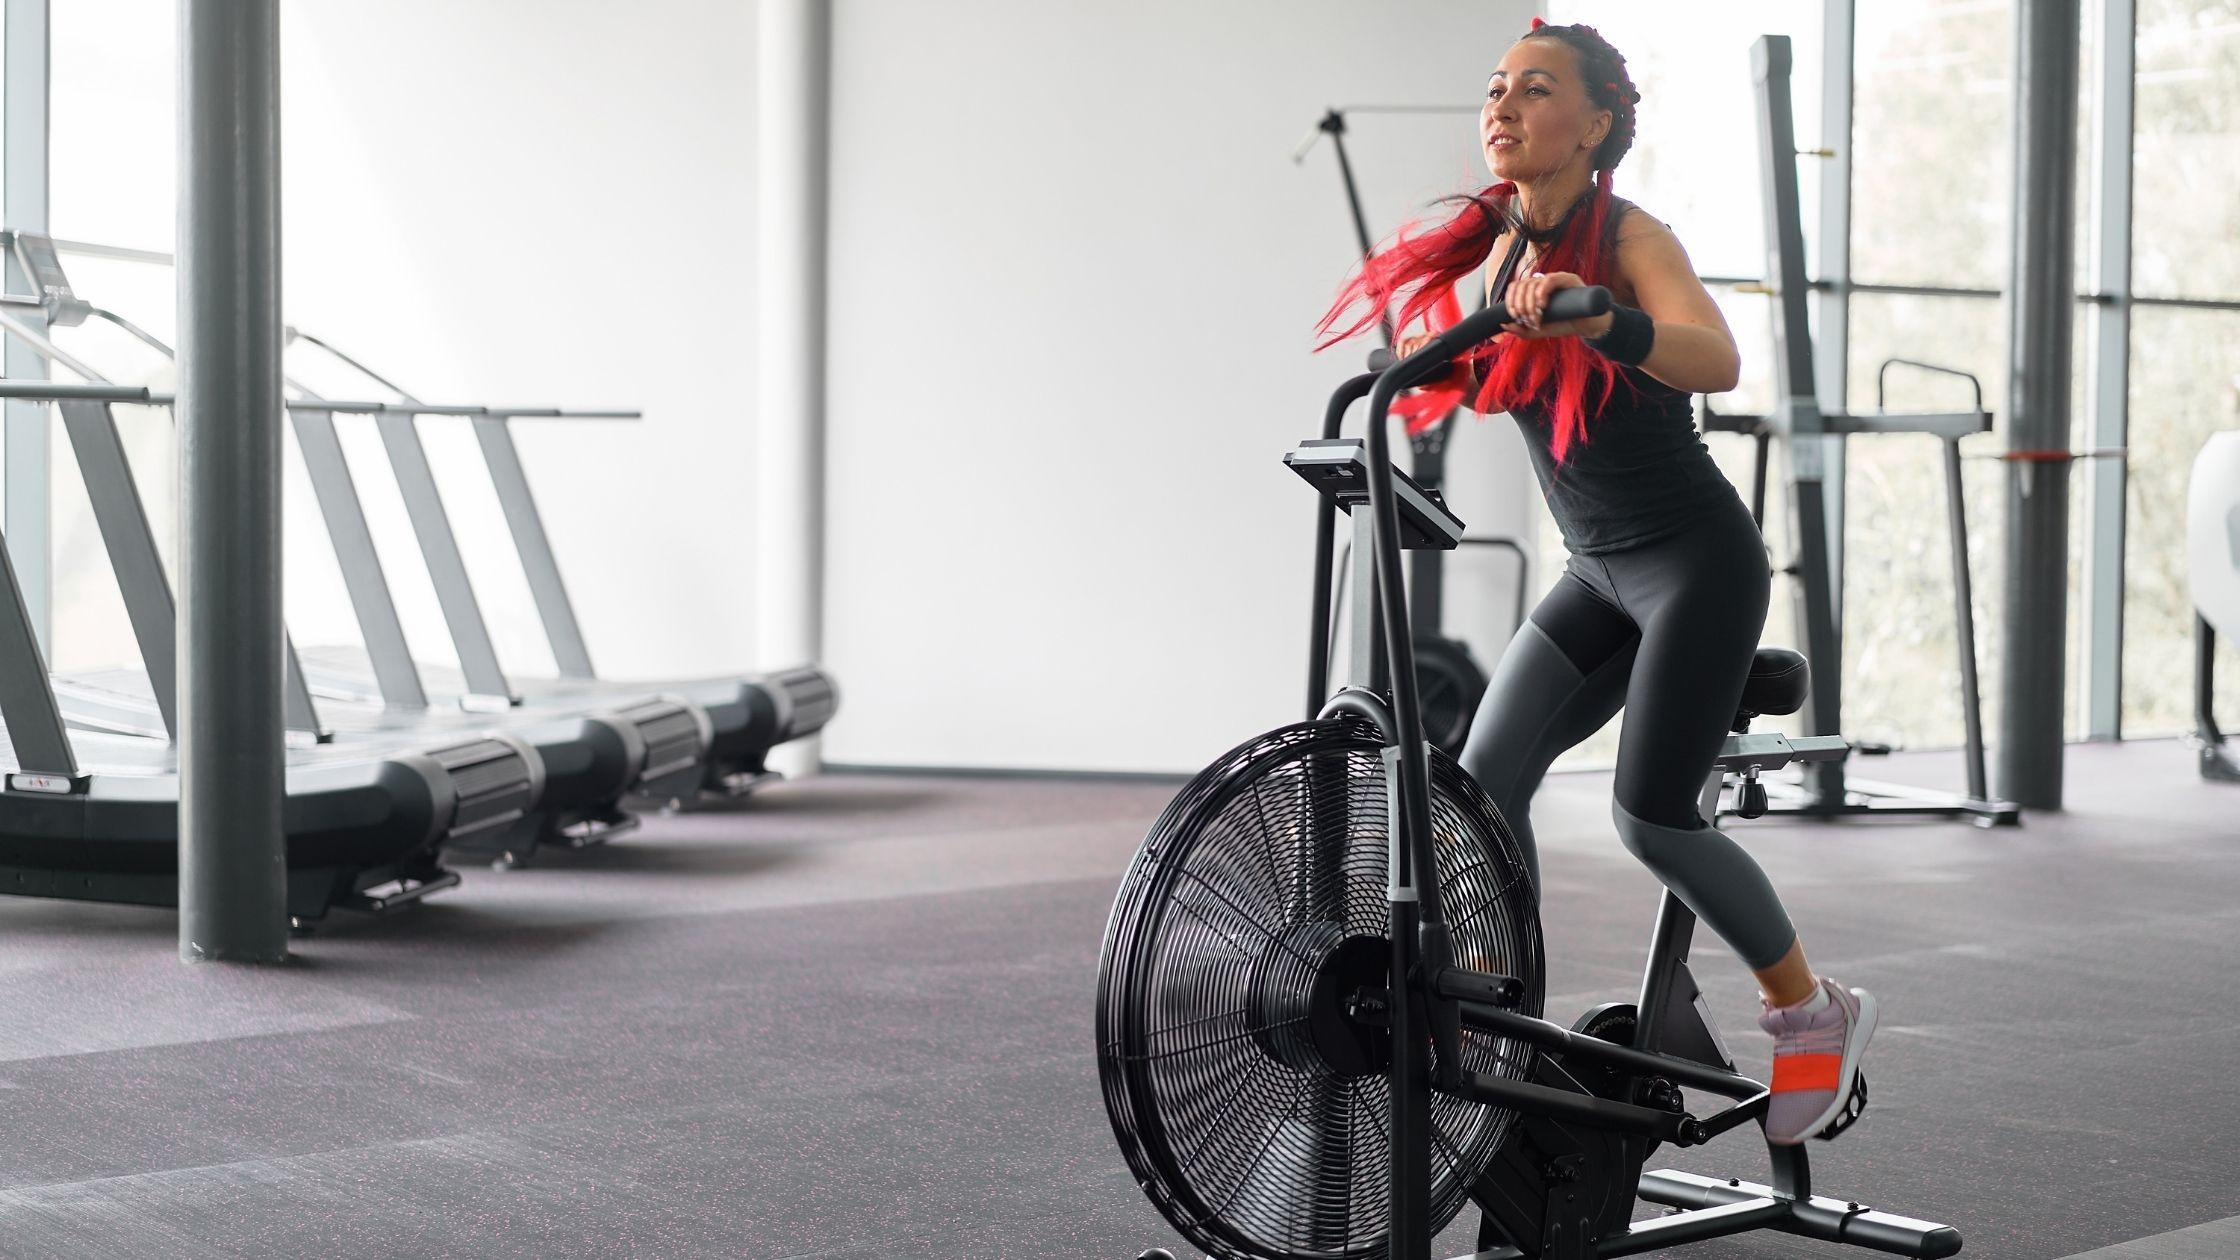 Types of exercise bikes: Fan/Air Bikes